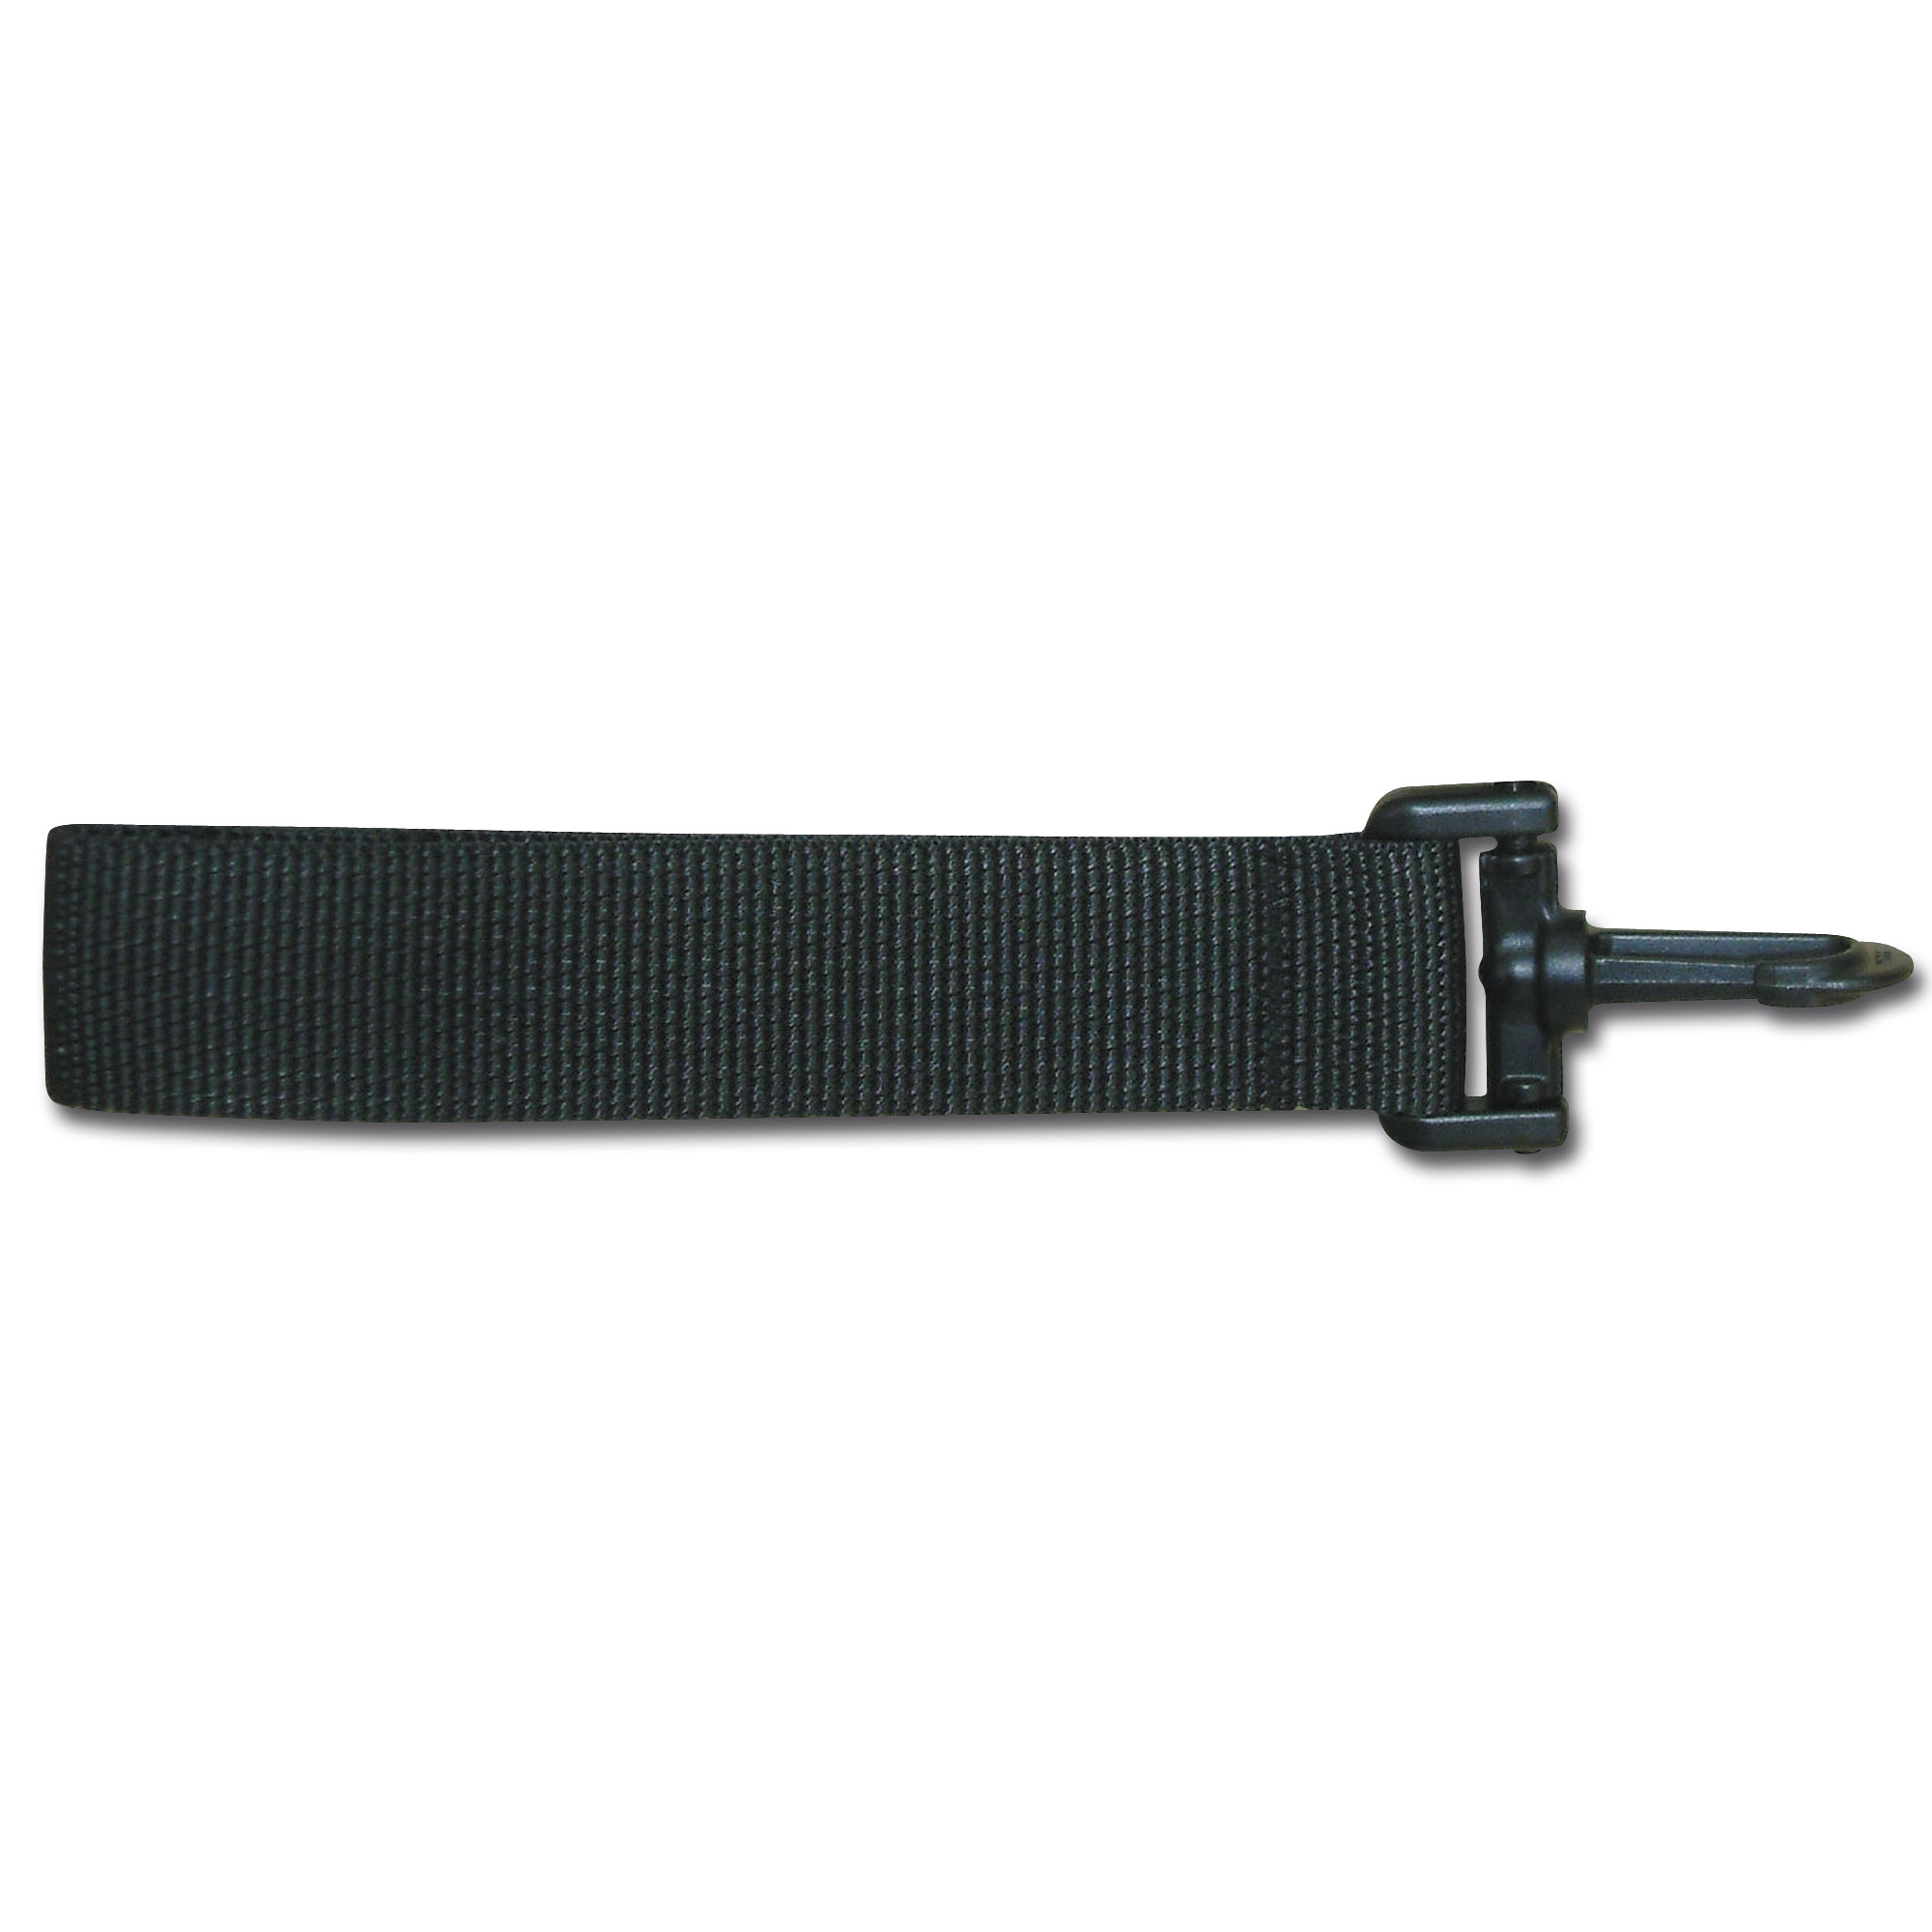 Koppelschlaufe TacGear schwarz 10 cm